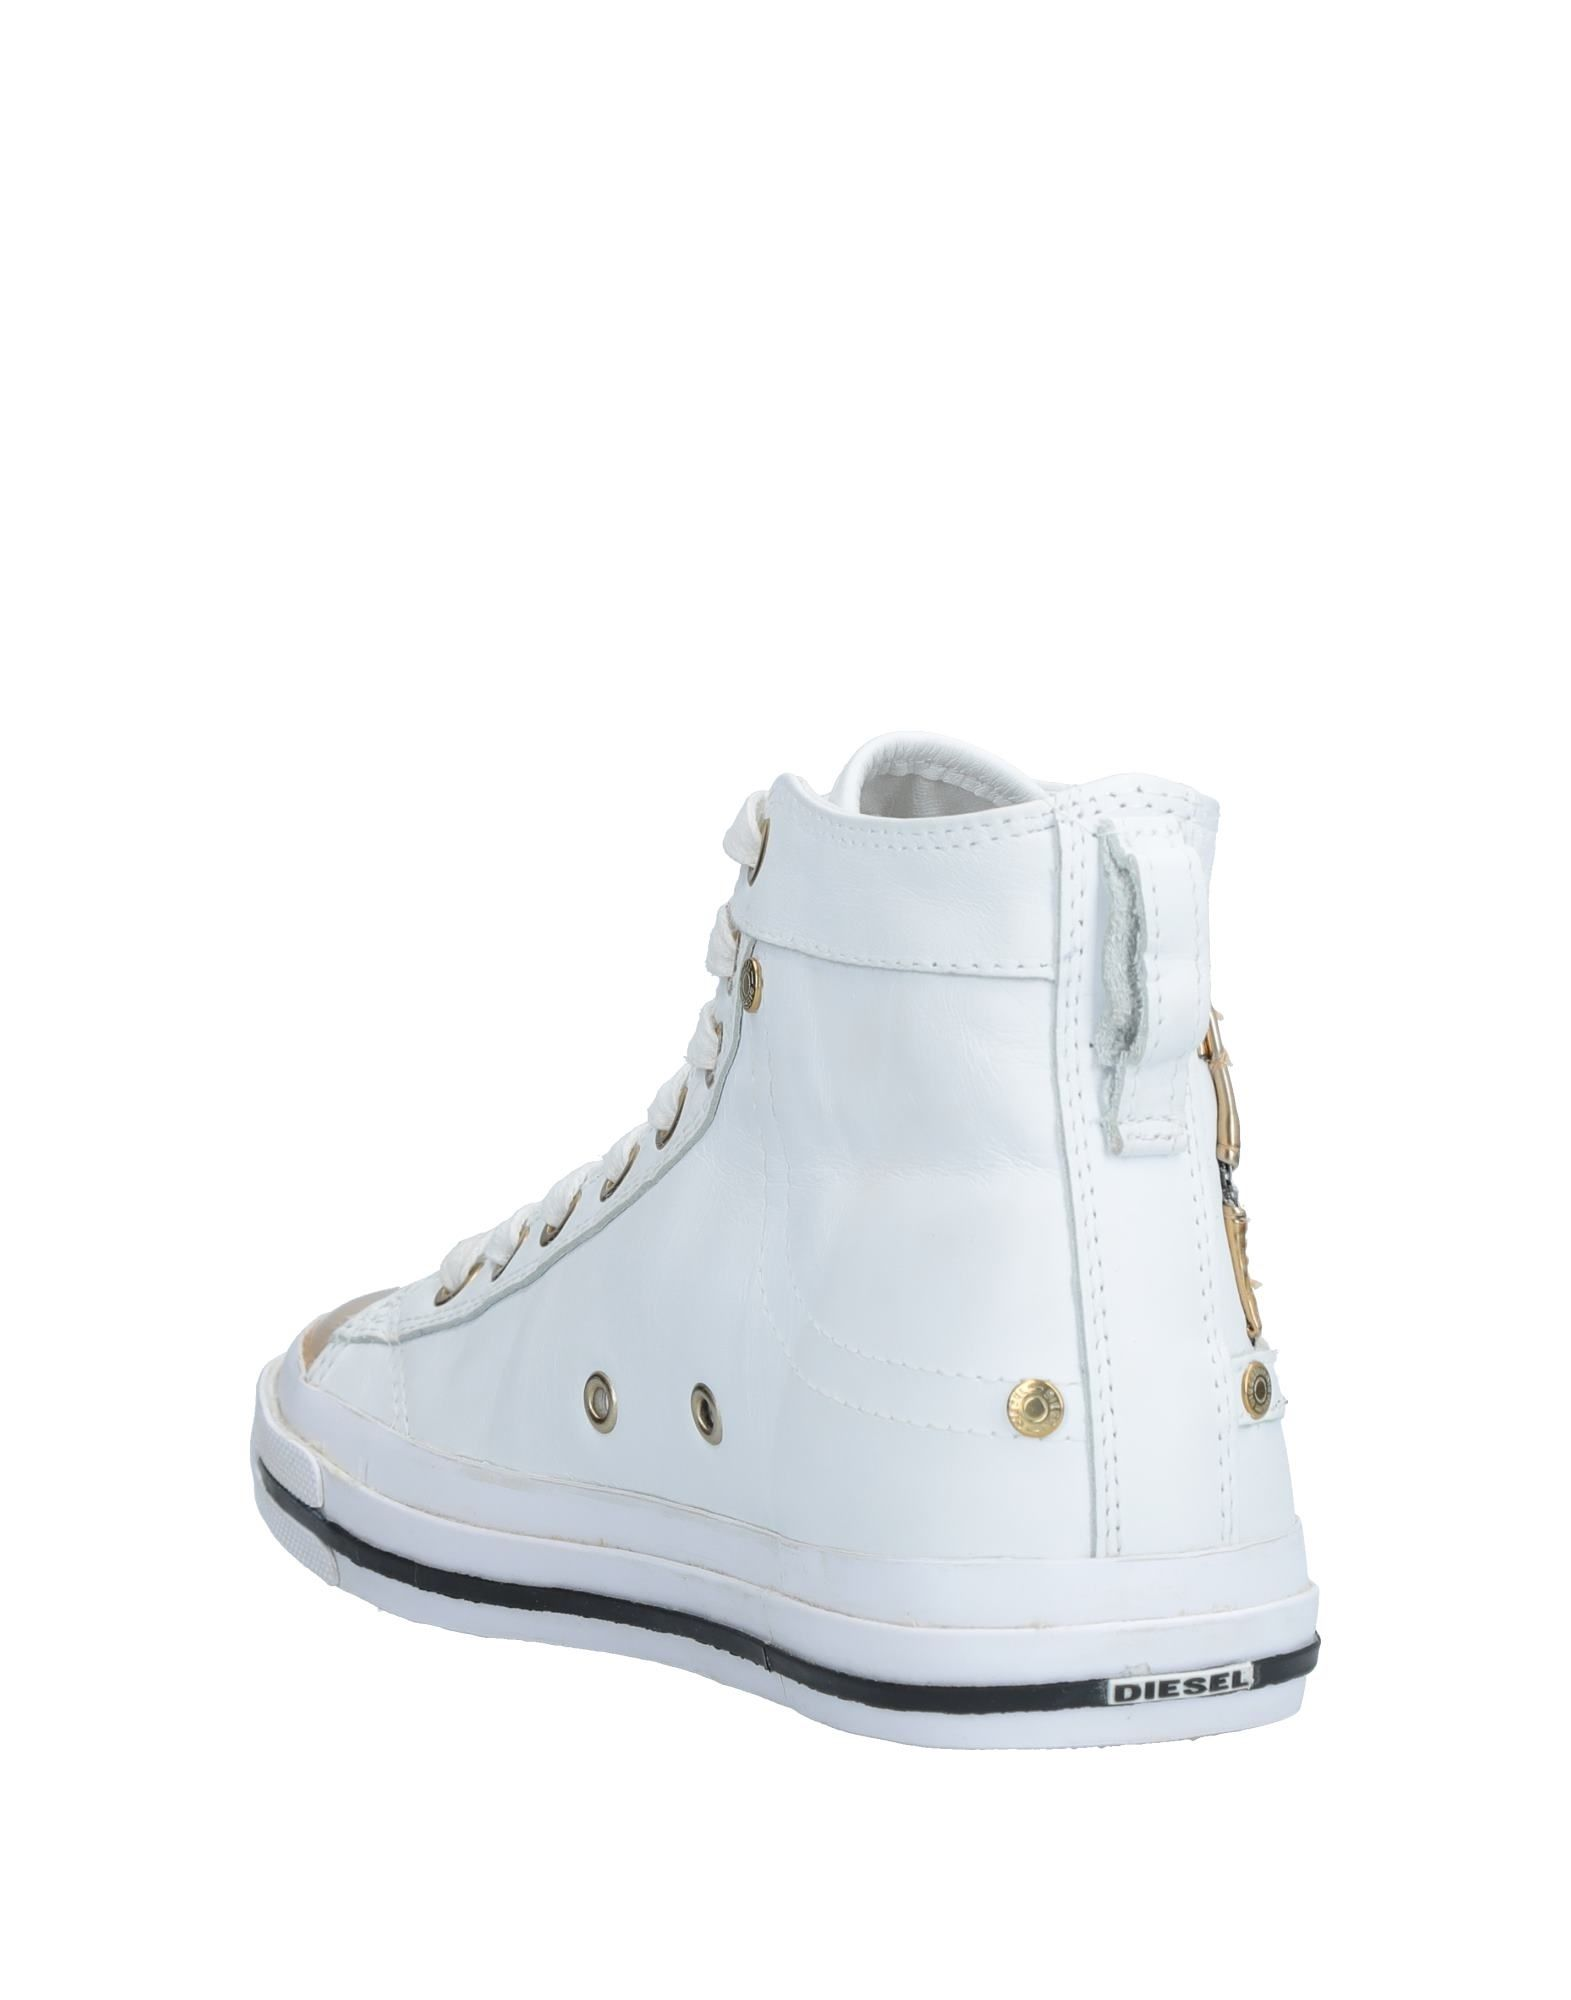 Diesel Sneakers Damen  Schuhe 11535281FL Gute Qualität beliebte Schuhe  f50f63